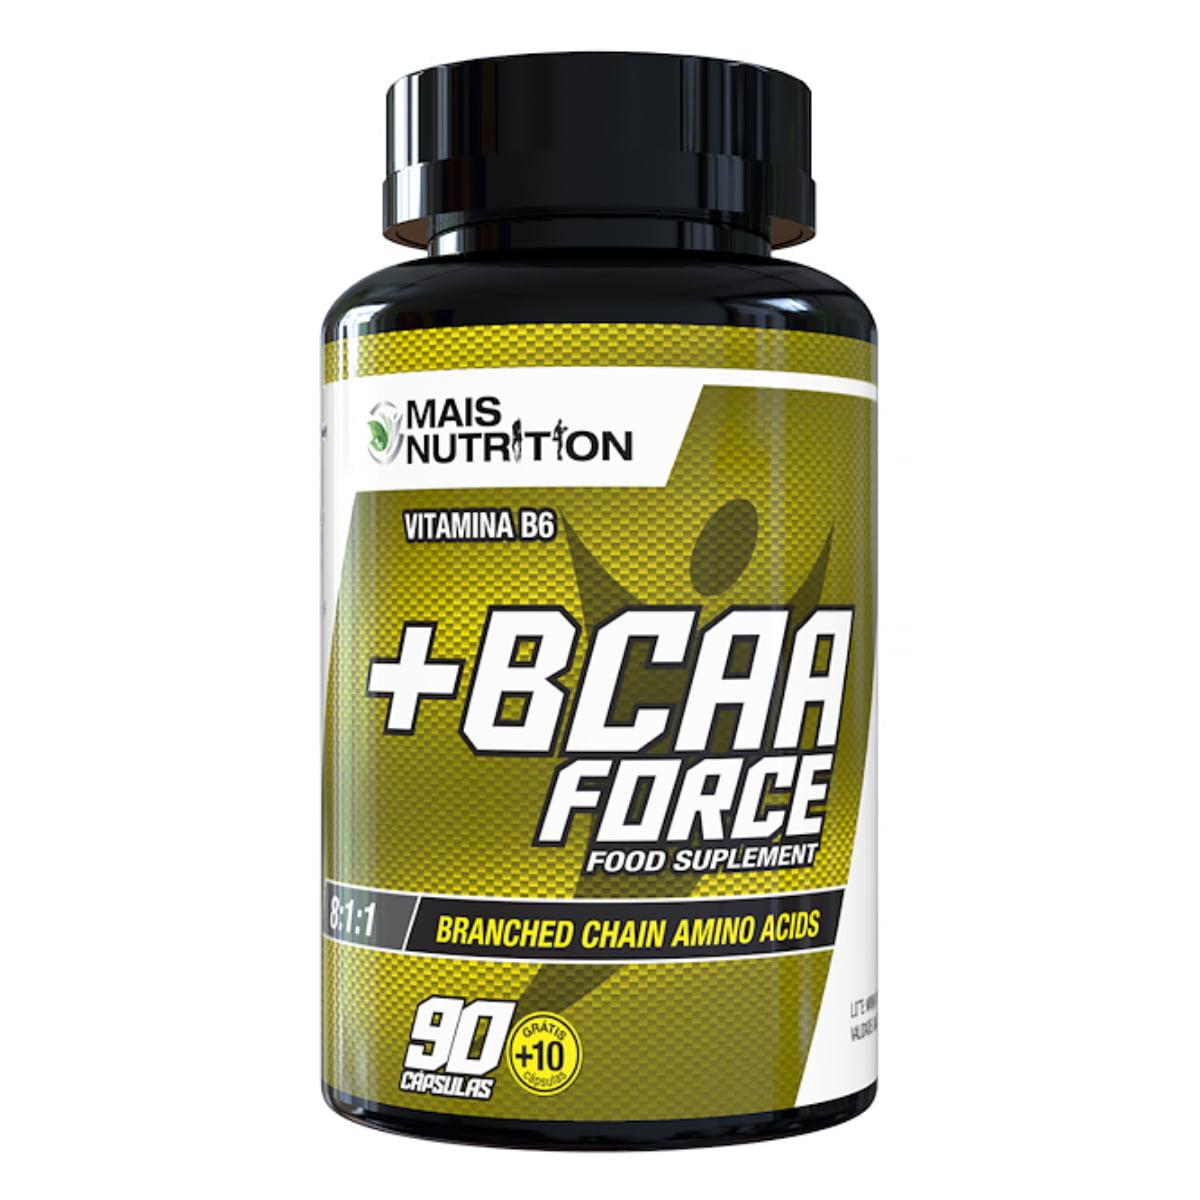 300 BCAA Force 100cp